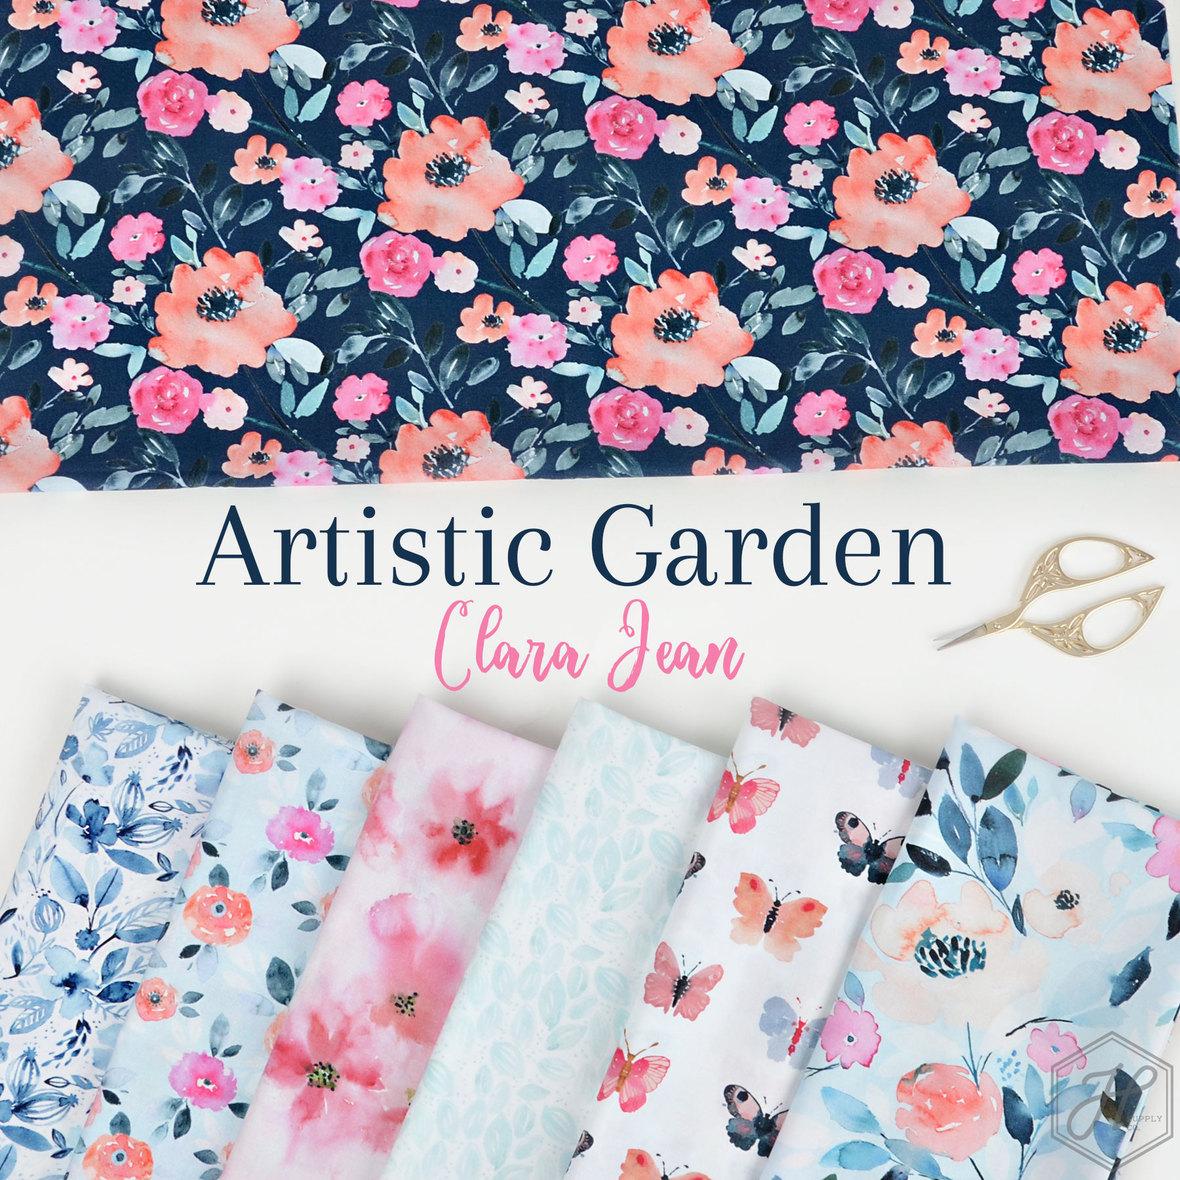 Artistic-Garden-Fabric-Poster-Clara-Jean-at-Hawthorne-Supply-Co